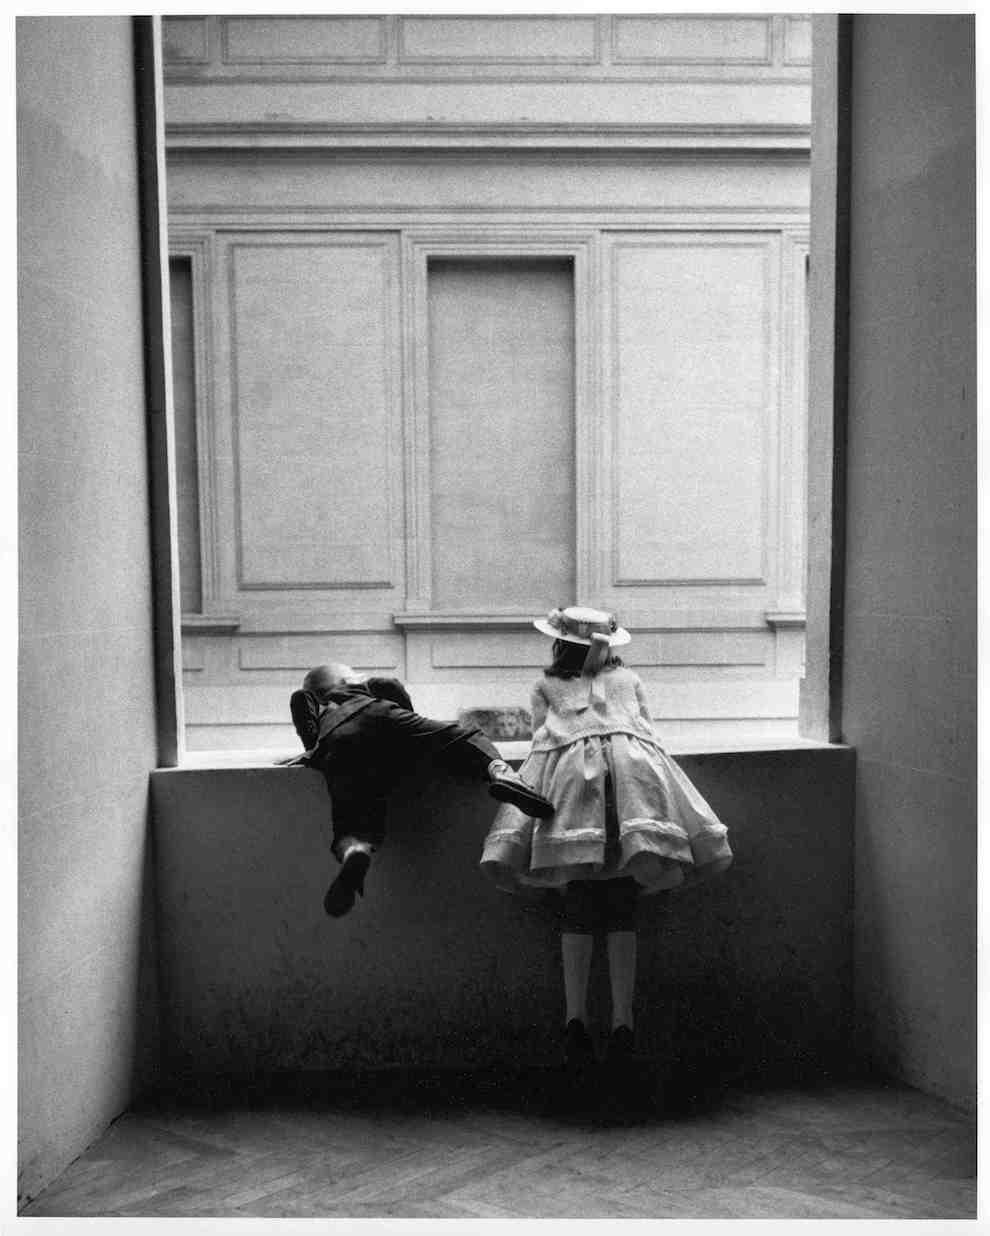 Gerardo Vielba. Niños del Louvre. París, 1962 ©Archivo familia Vielba